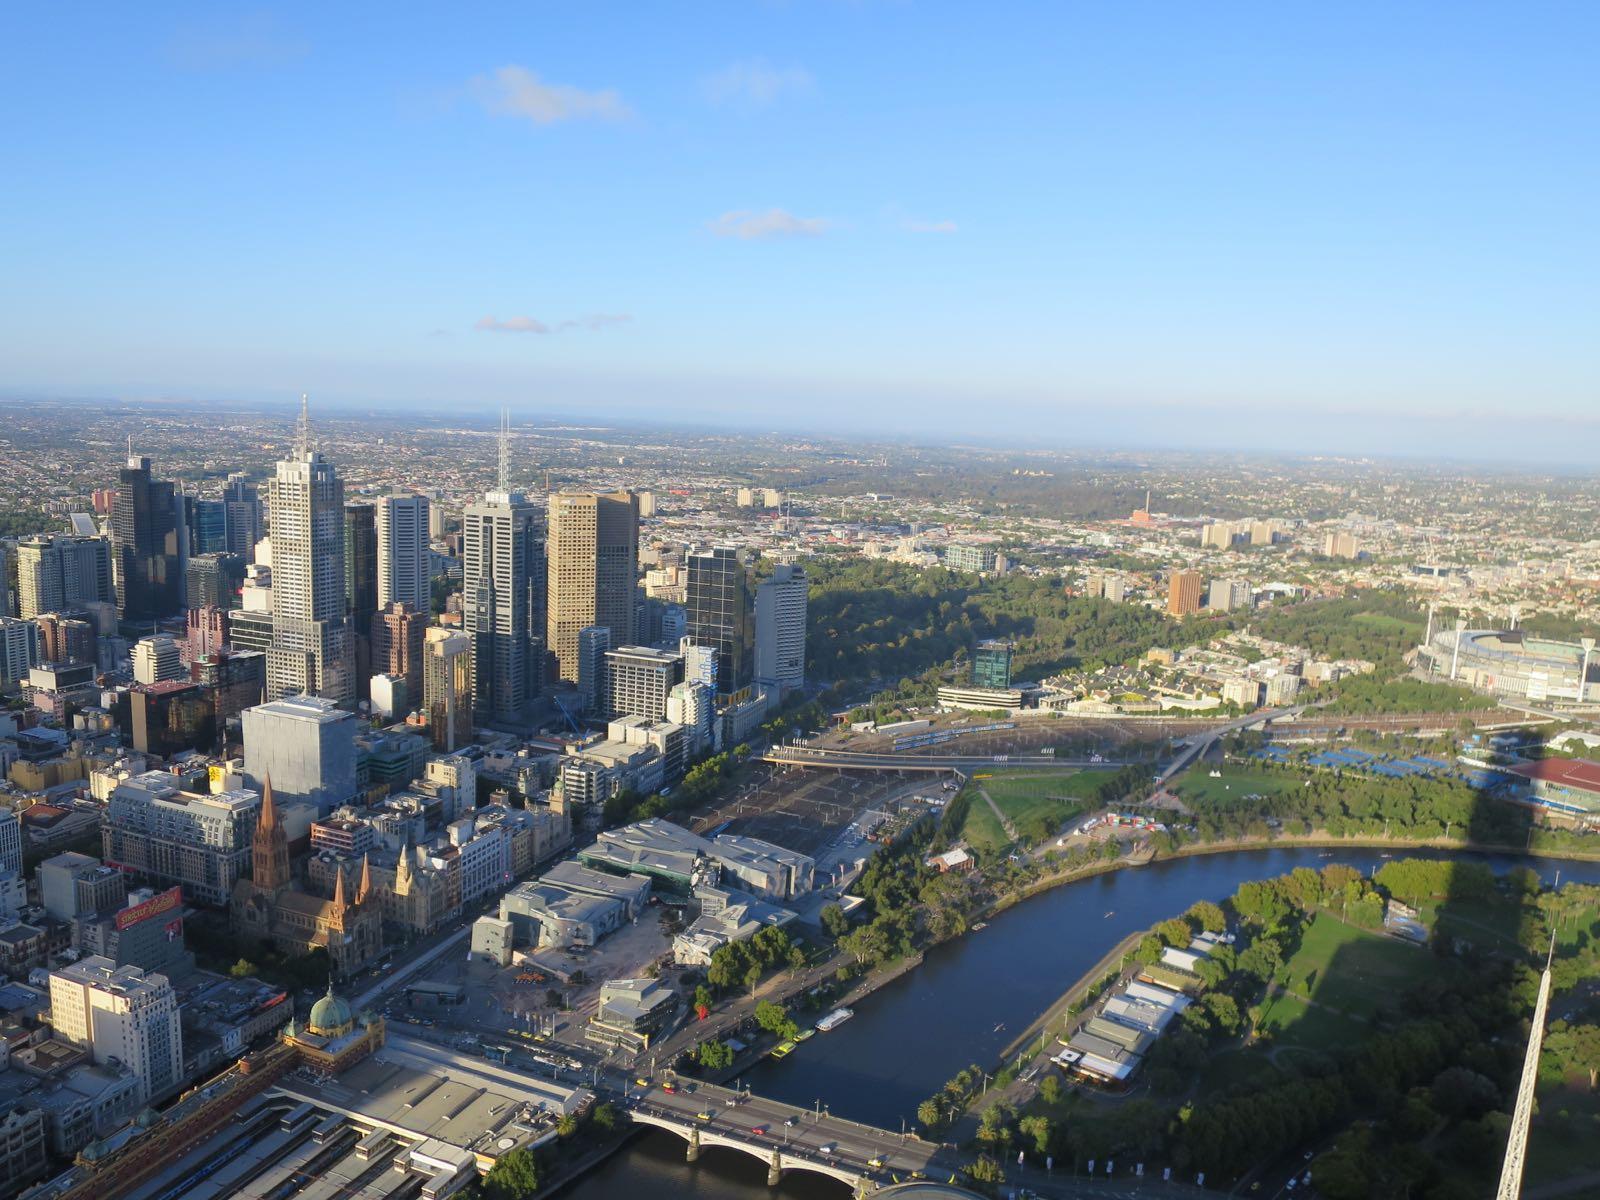 Melbourne Eureka Skydeck -pilvenpiirtäjän 88. kerroksesta